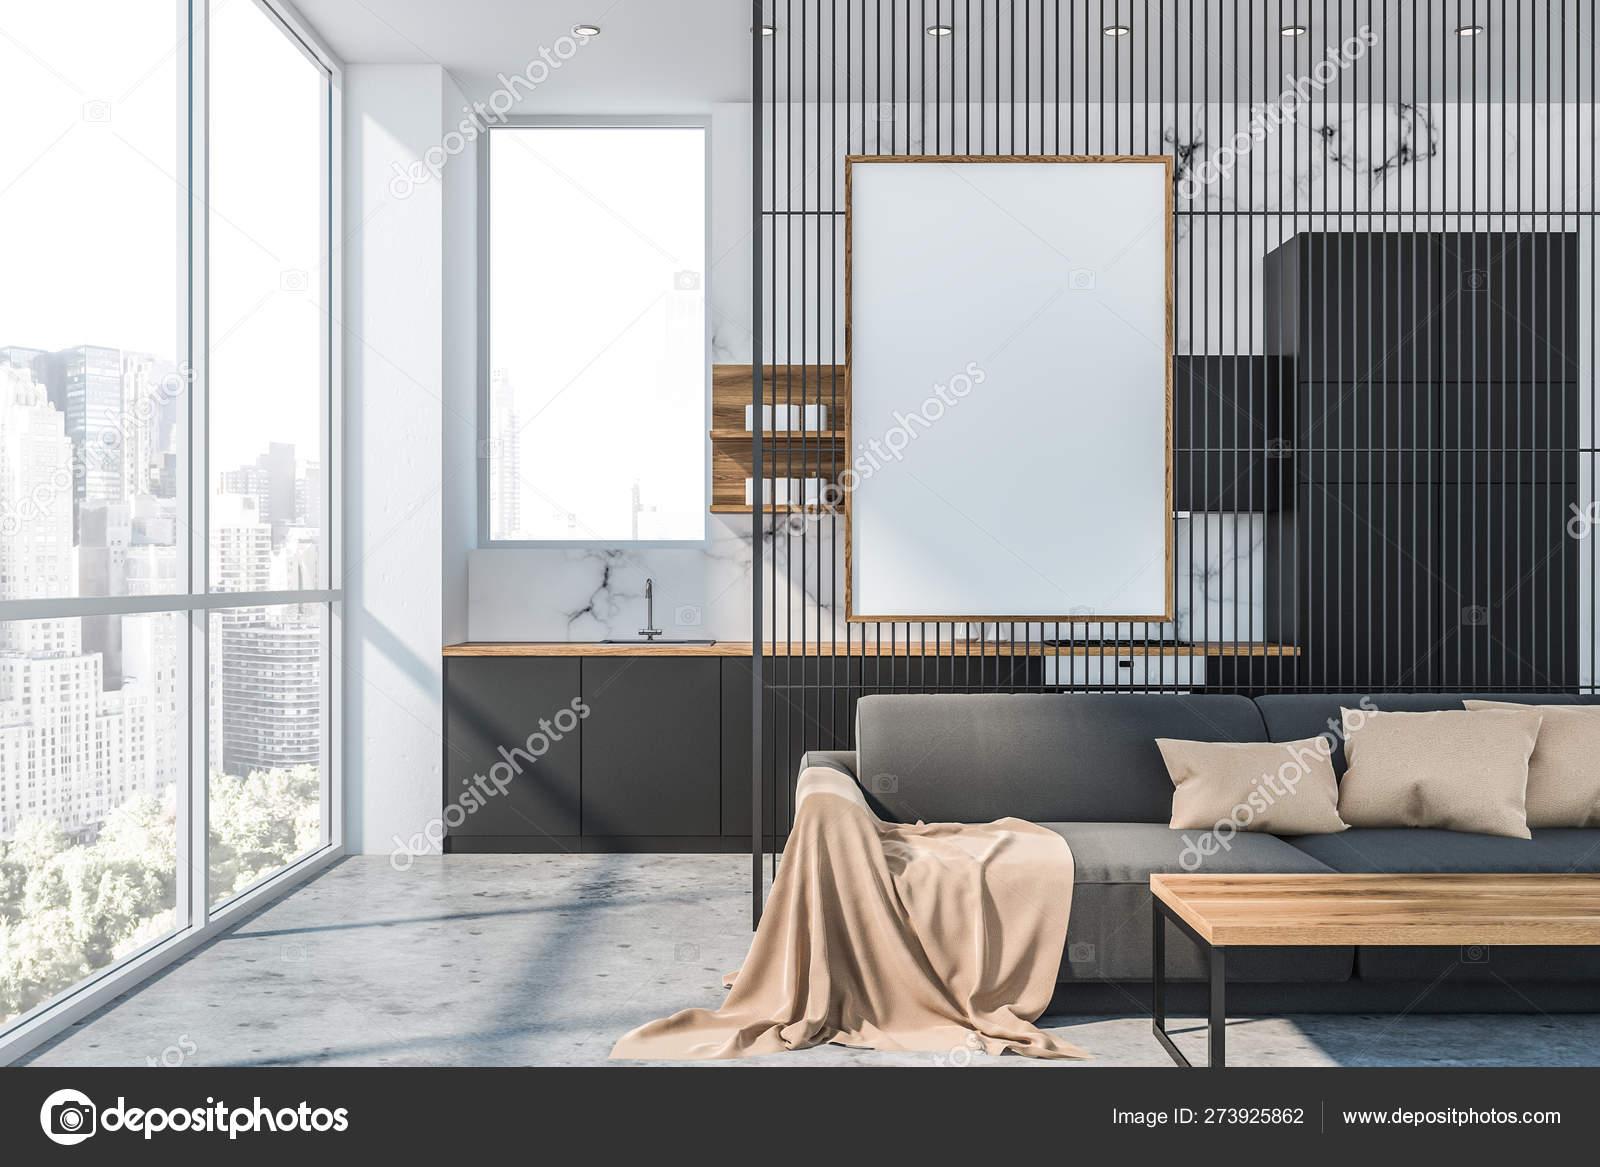 White Marble Living Room And Kitchen Poster Stock Photo C Denisismagilov 273925862